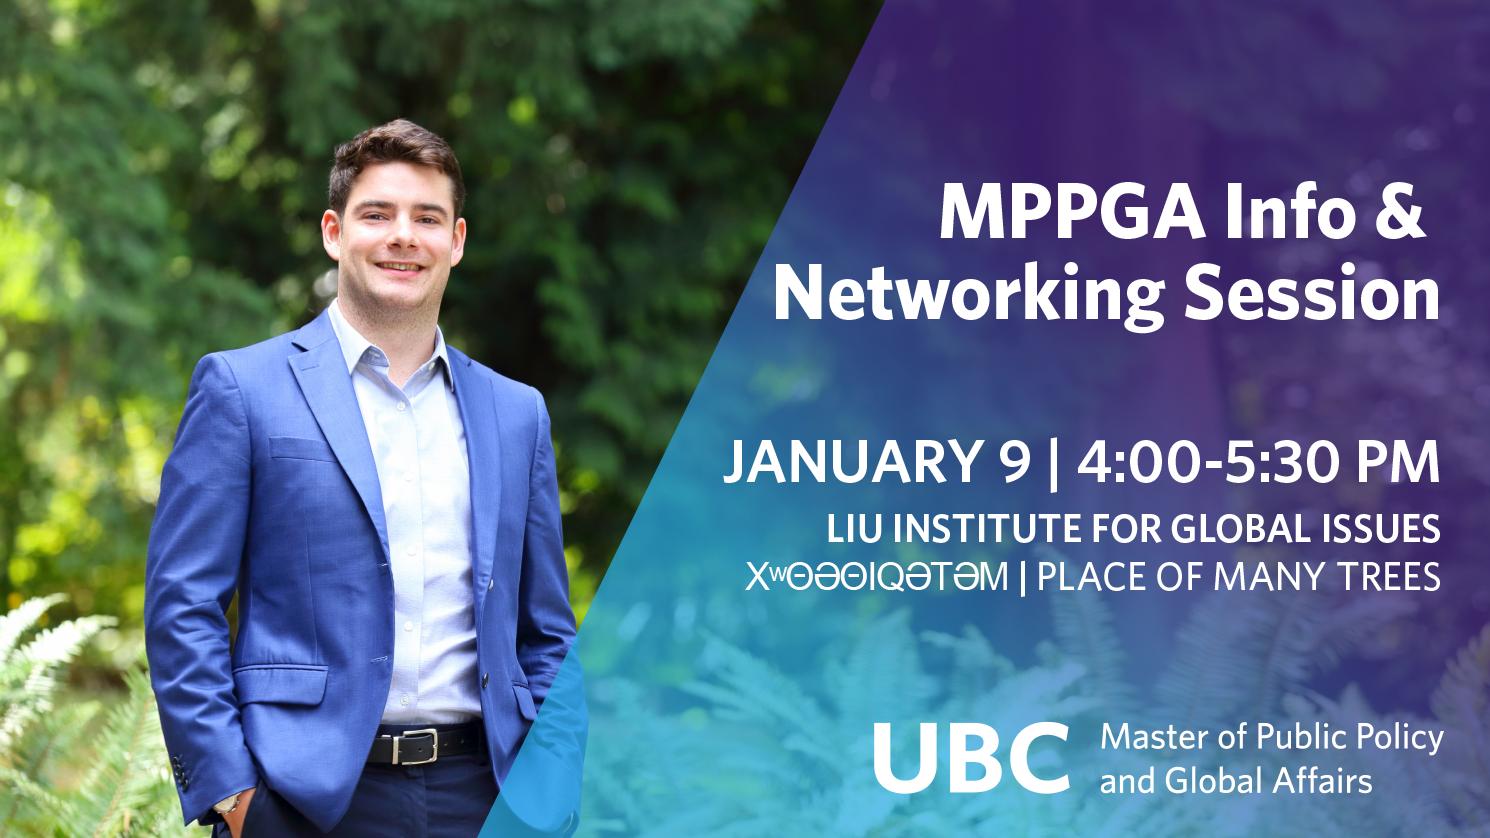 MPPGA Jan. 9 Info Session